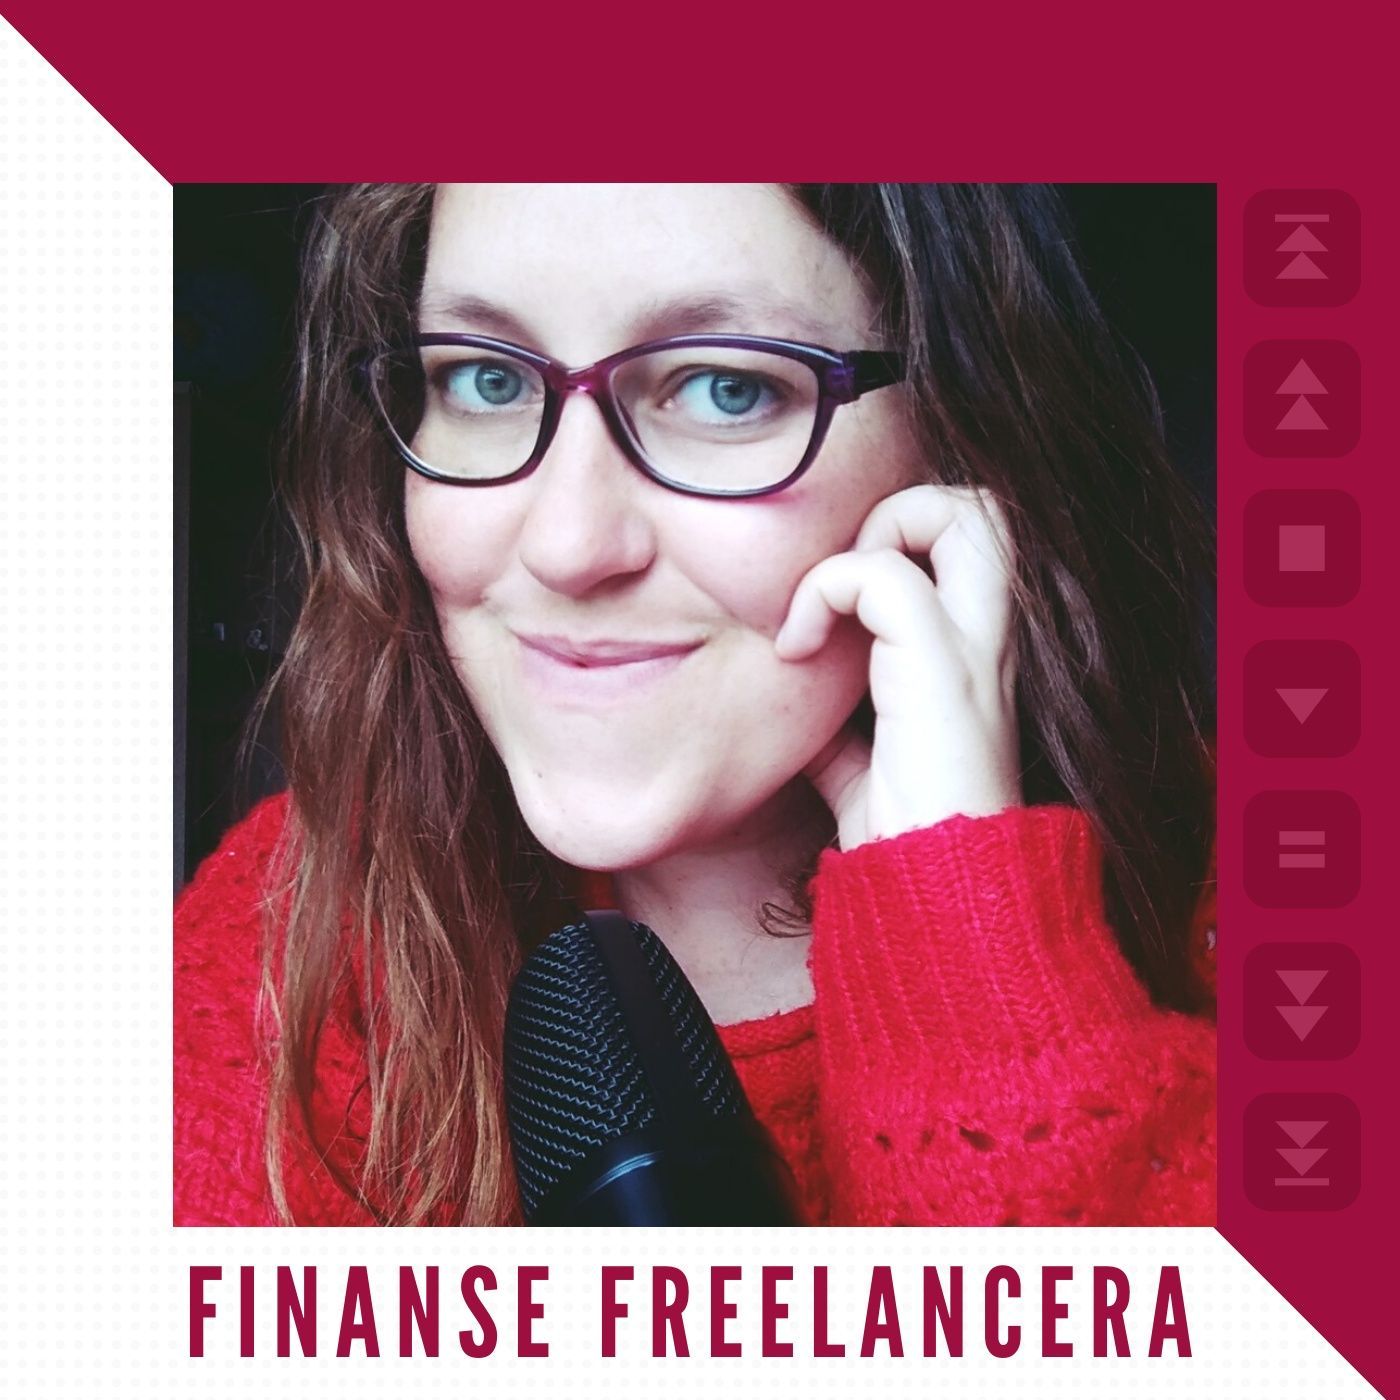 Finanse freelancera - Blog Firma #5